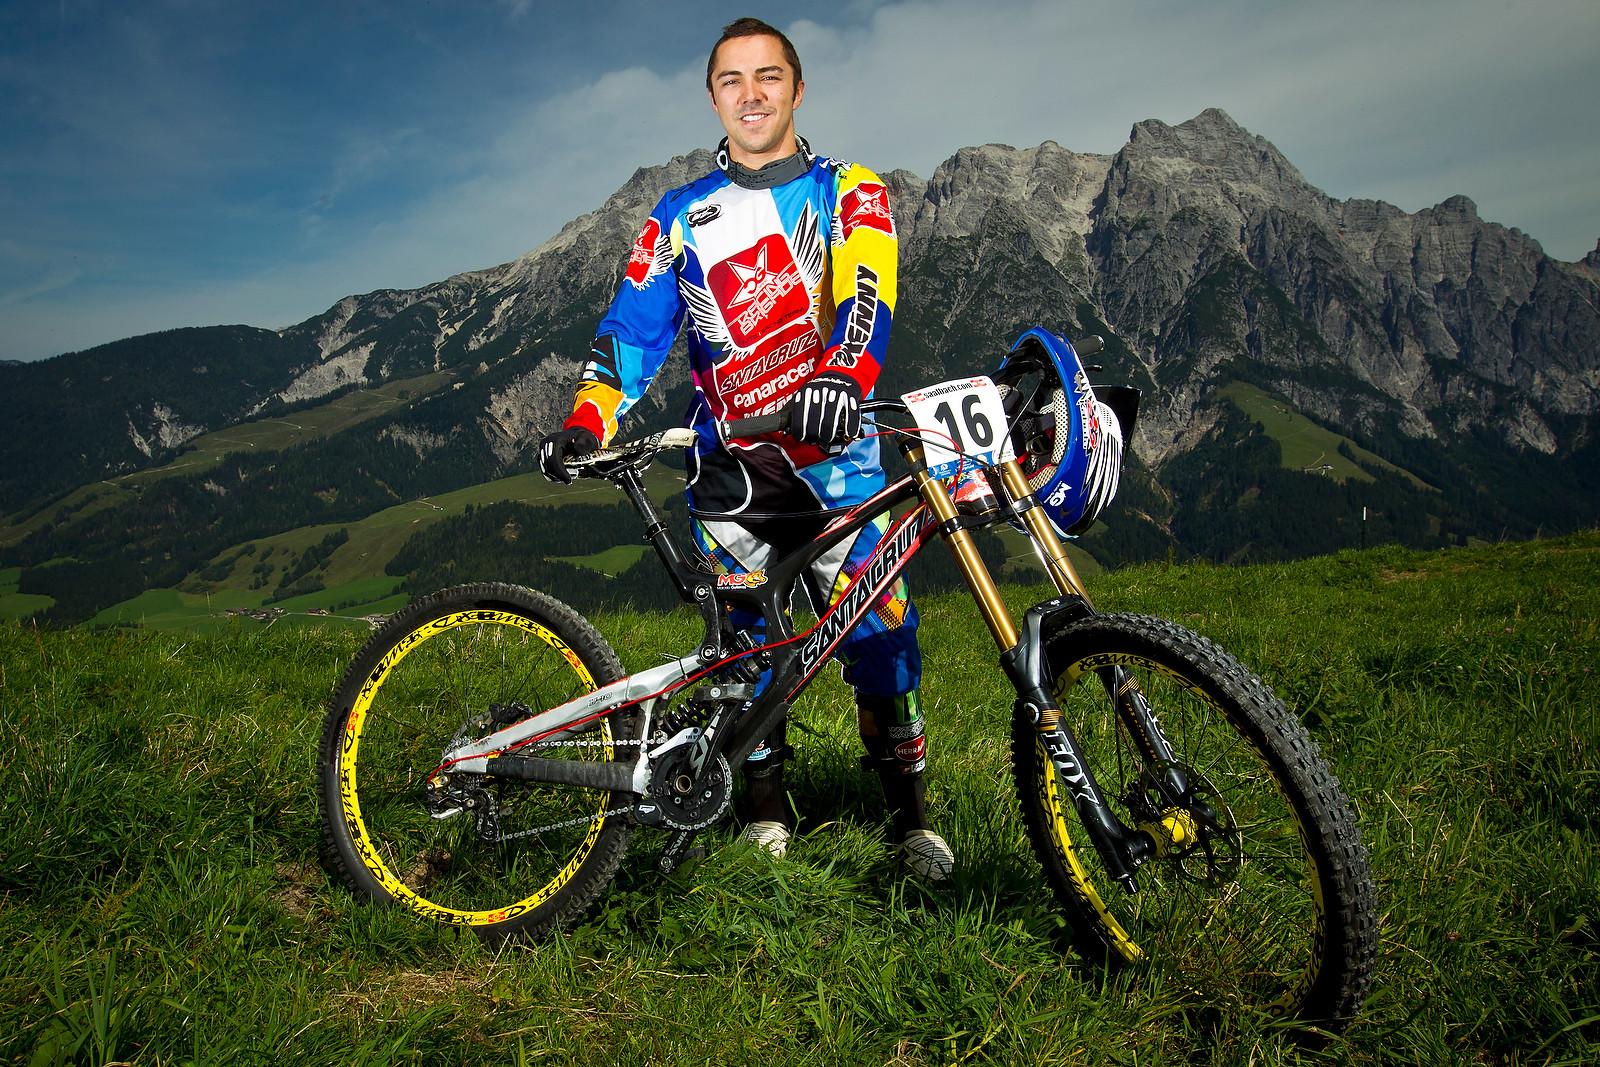 Marcelo Gutierrez with his Santa Cruz V10c - World Championships Riders and Bikes - Mountain Biking Pictures - Vital MTB